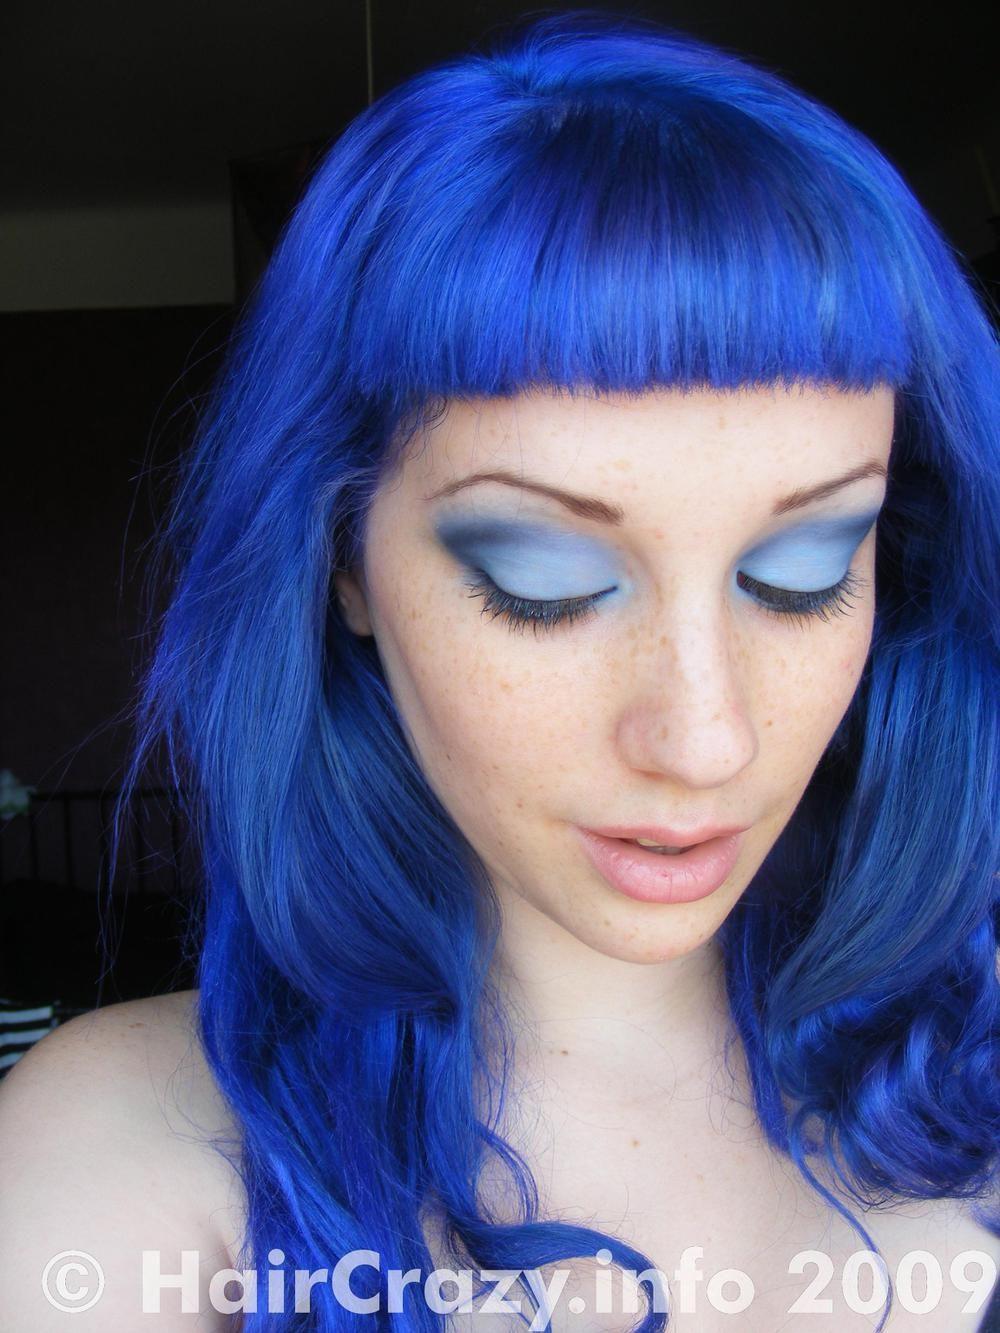 Blue Mayhem Is An Intense Deep Blue Semipermanent Hair Dye From - Hair colour in blue